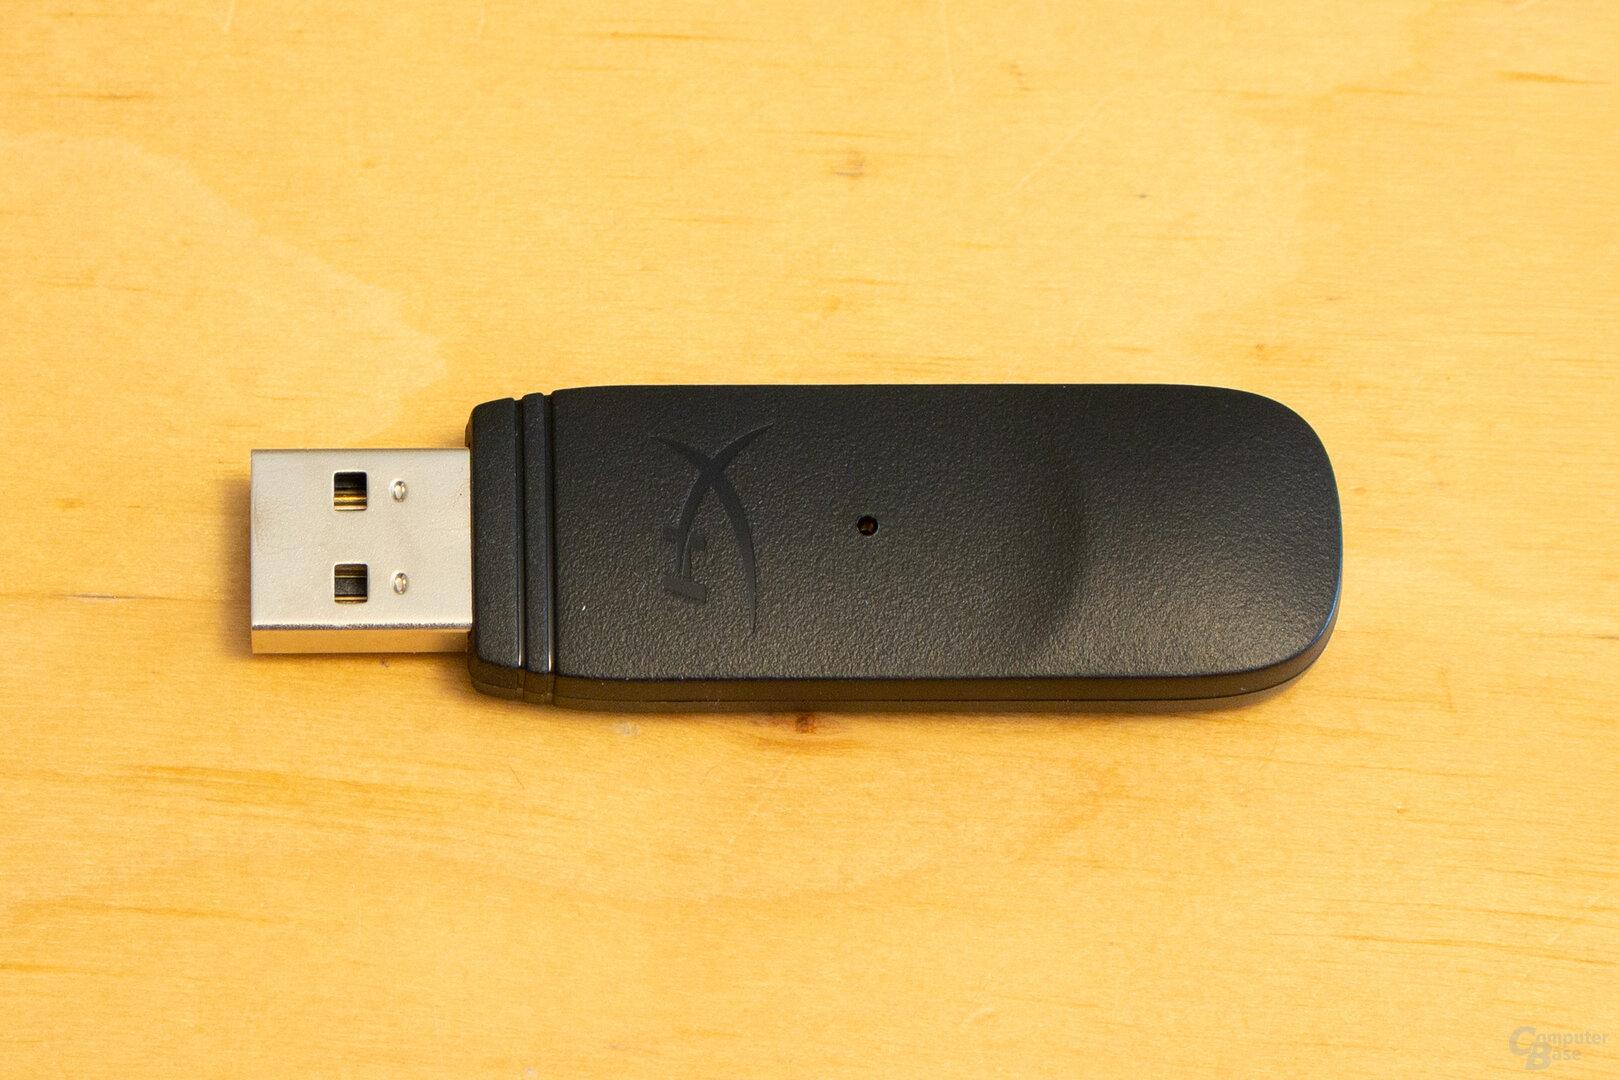 Der USB-Dongle des HyperX Cloud II Wireless